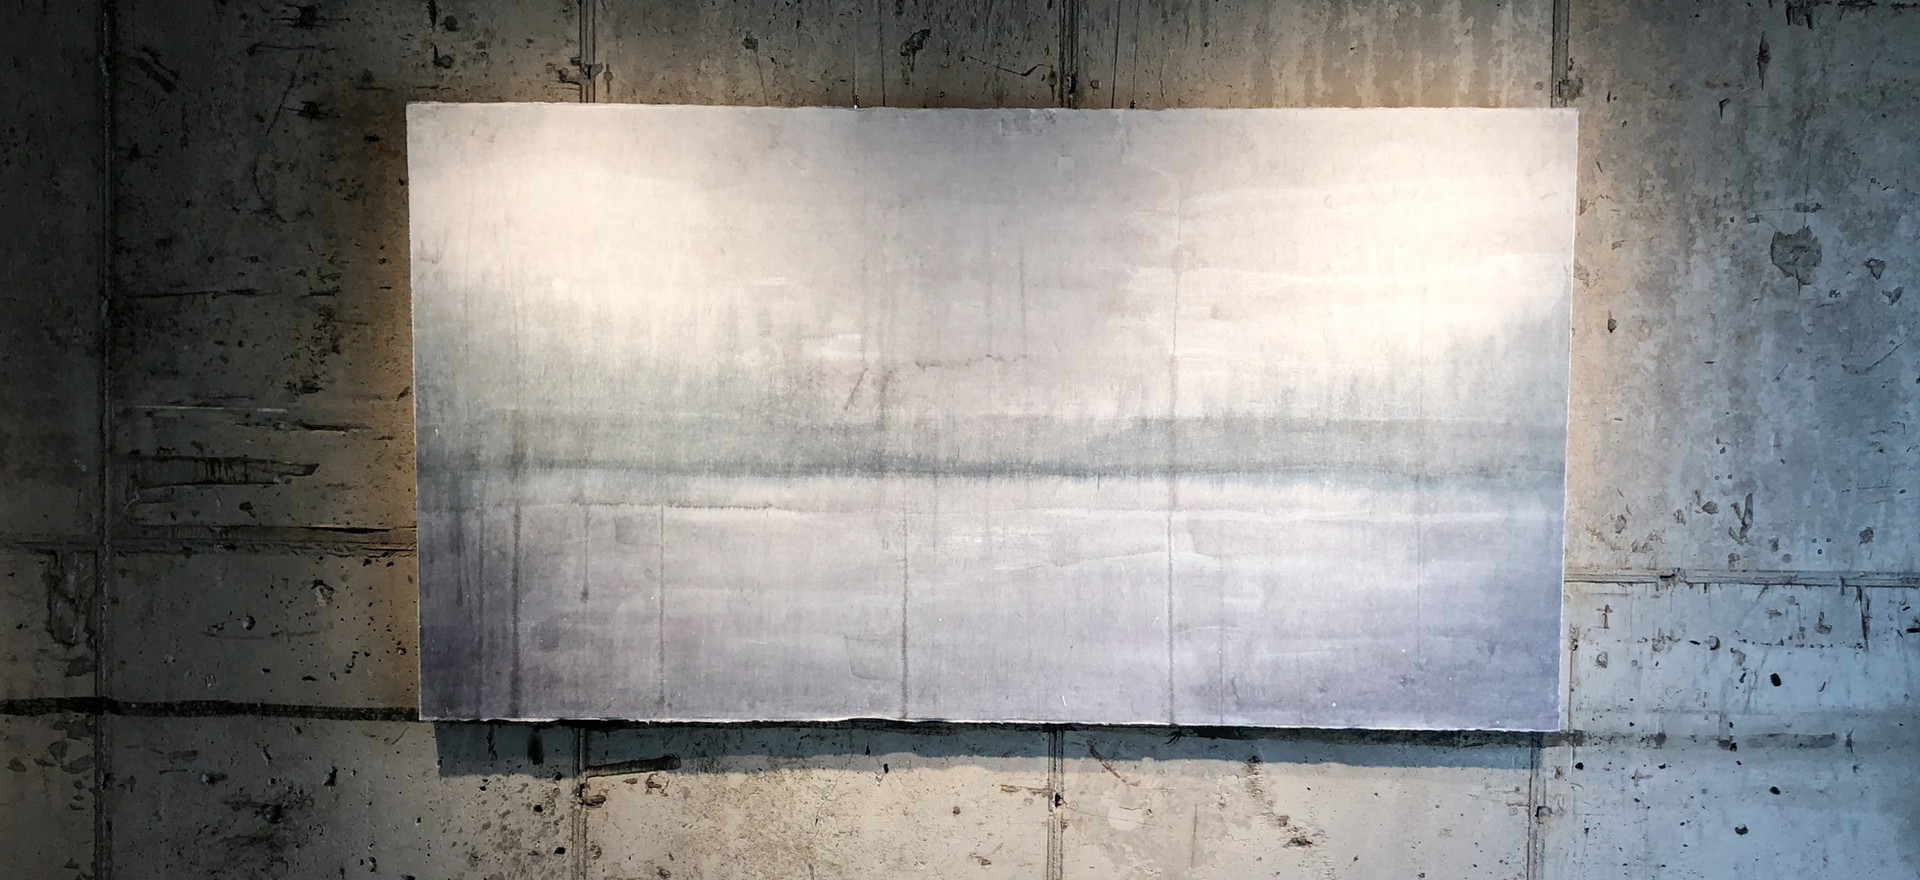 Untitled, 2018, Watercolour on hanji, 142*75